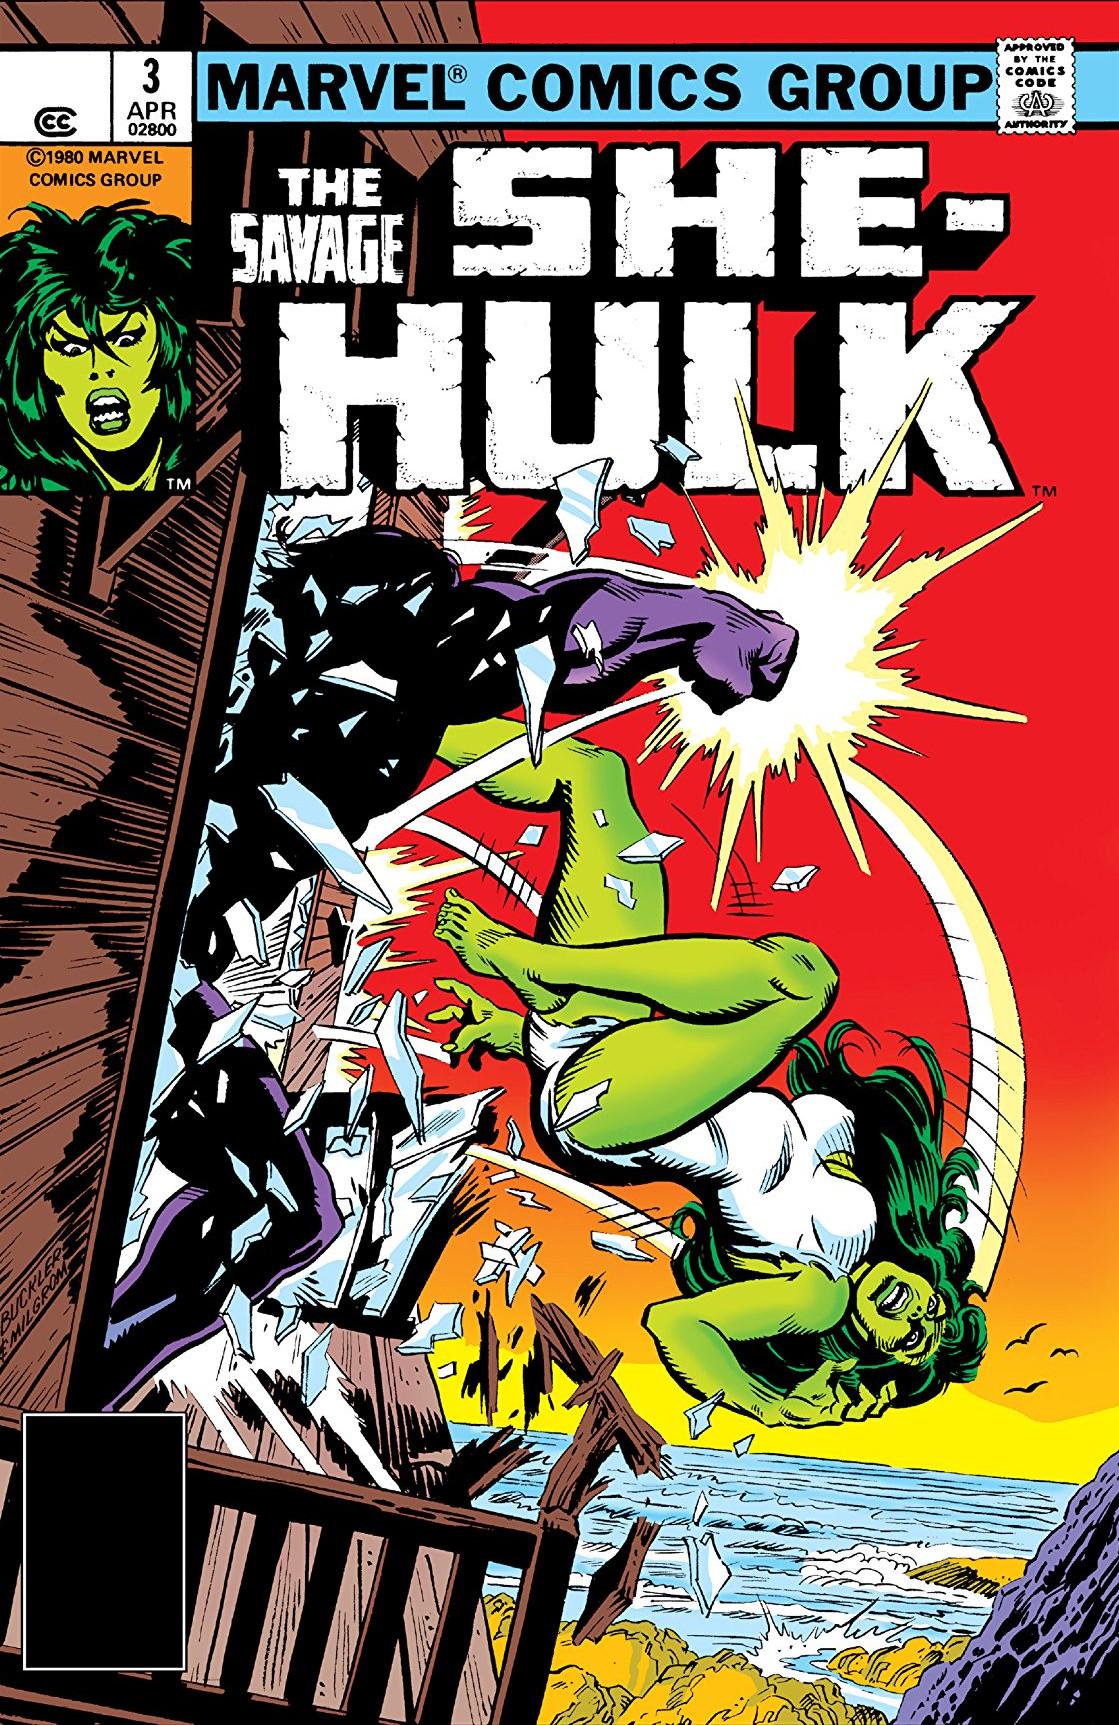 Savage She-Hulk Vol 1 3 - Marvel Comics Database